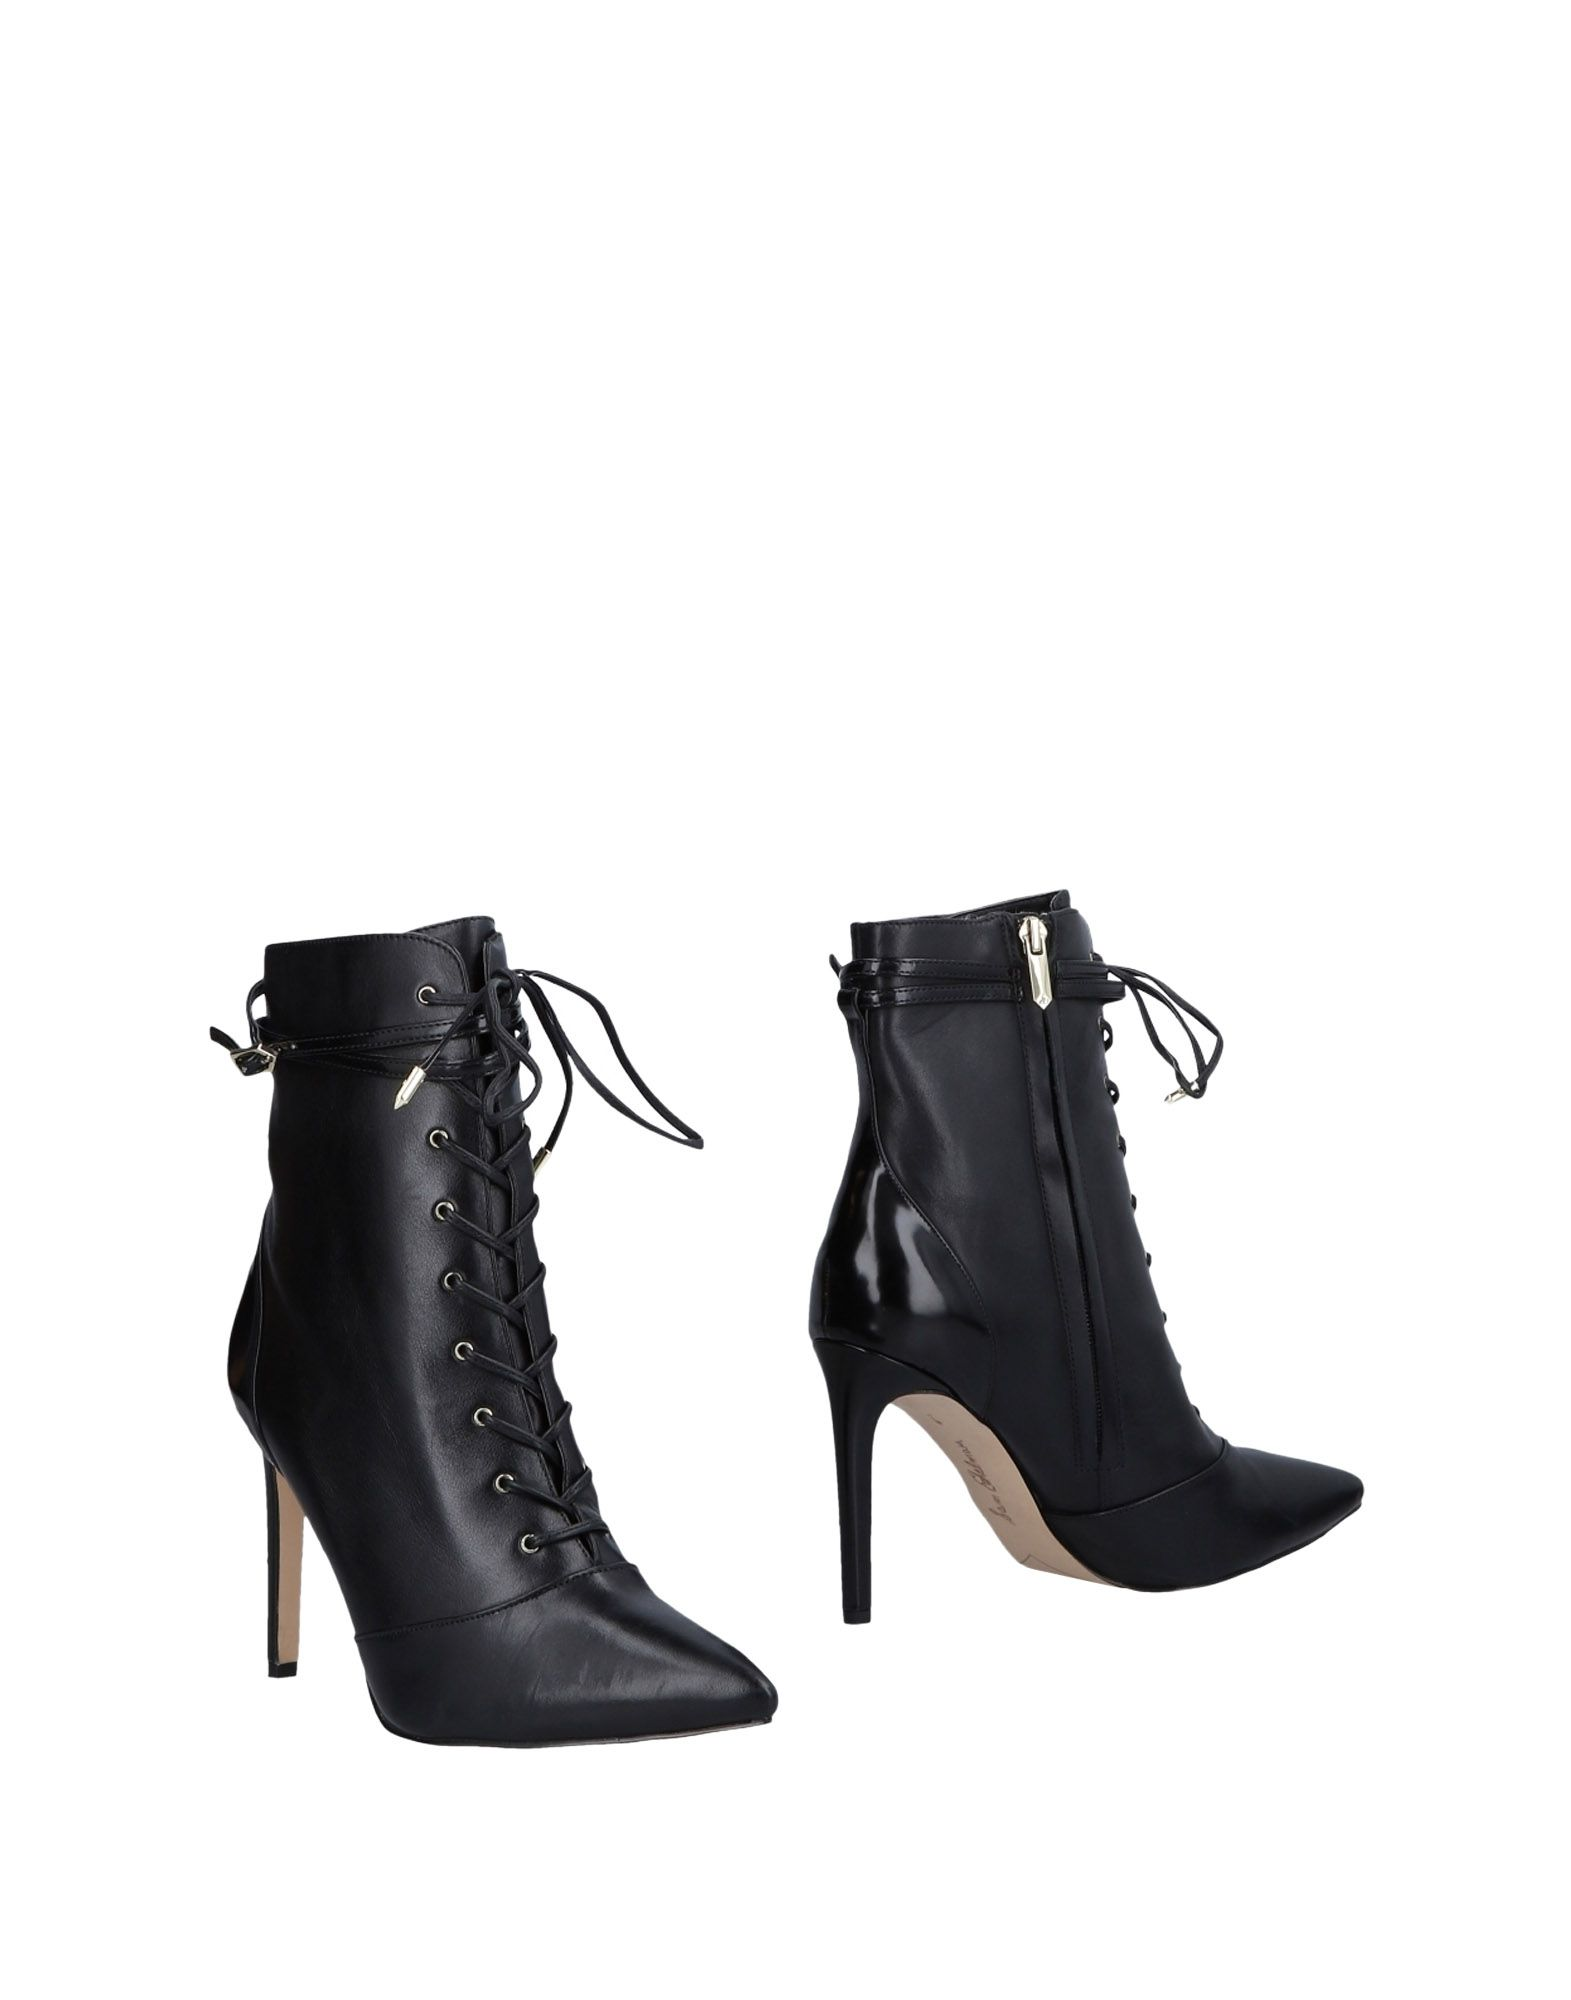 Stilvolle billige Schuhe Damen Sam Edelman Stiefelette Damen Schuhe  11478025UR e16810